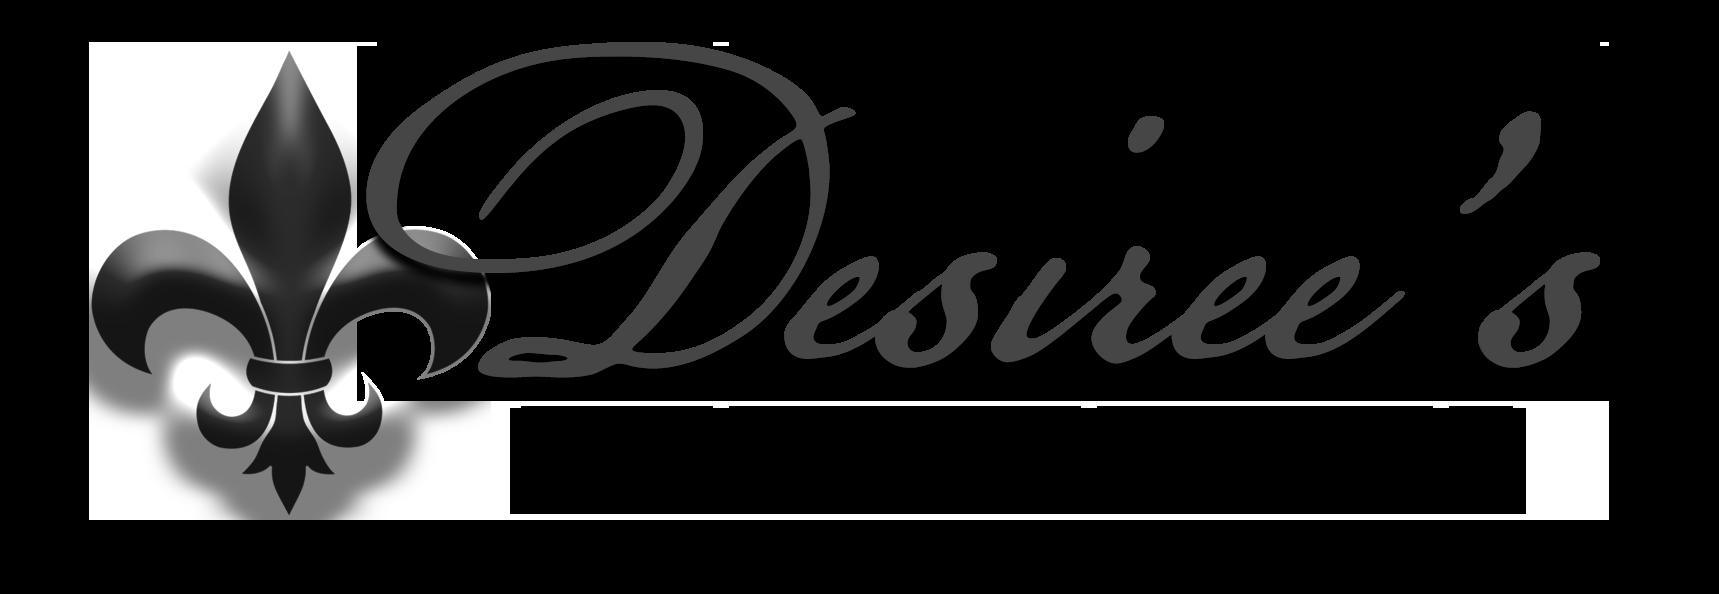 Desirees D1 transparent